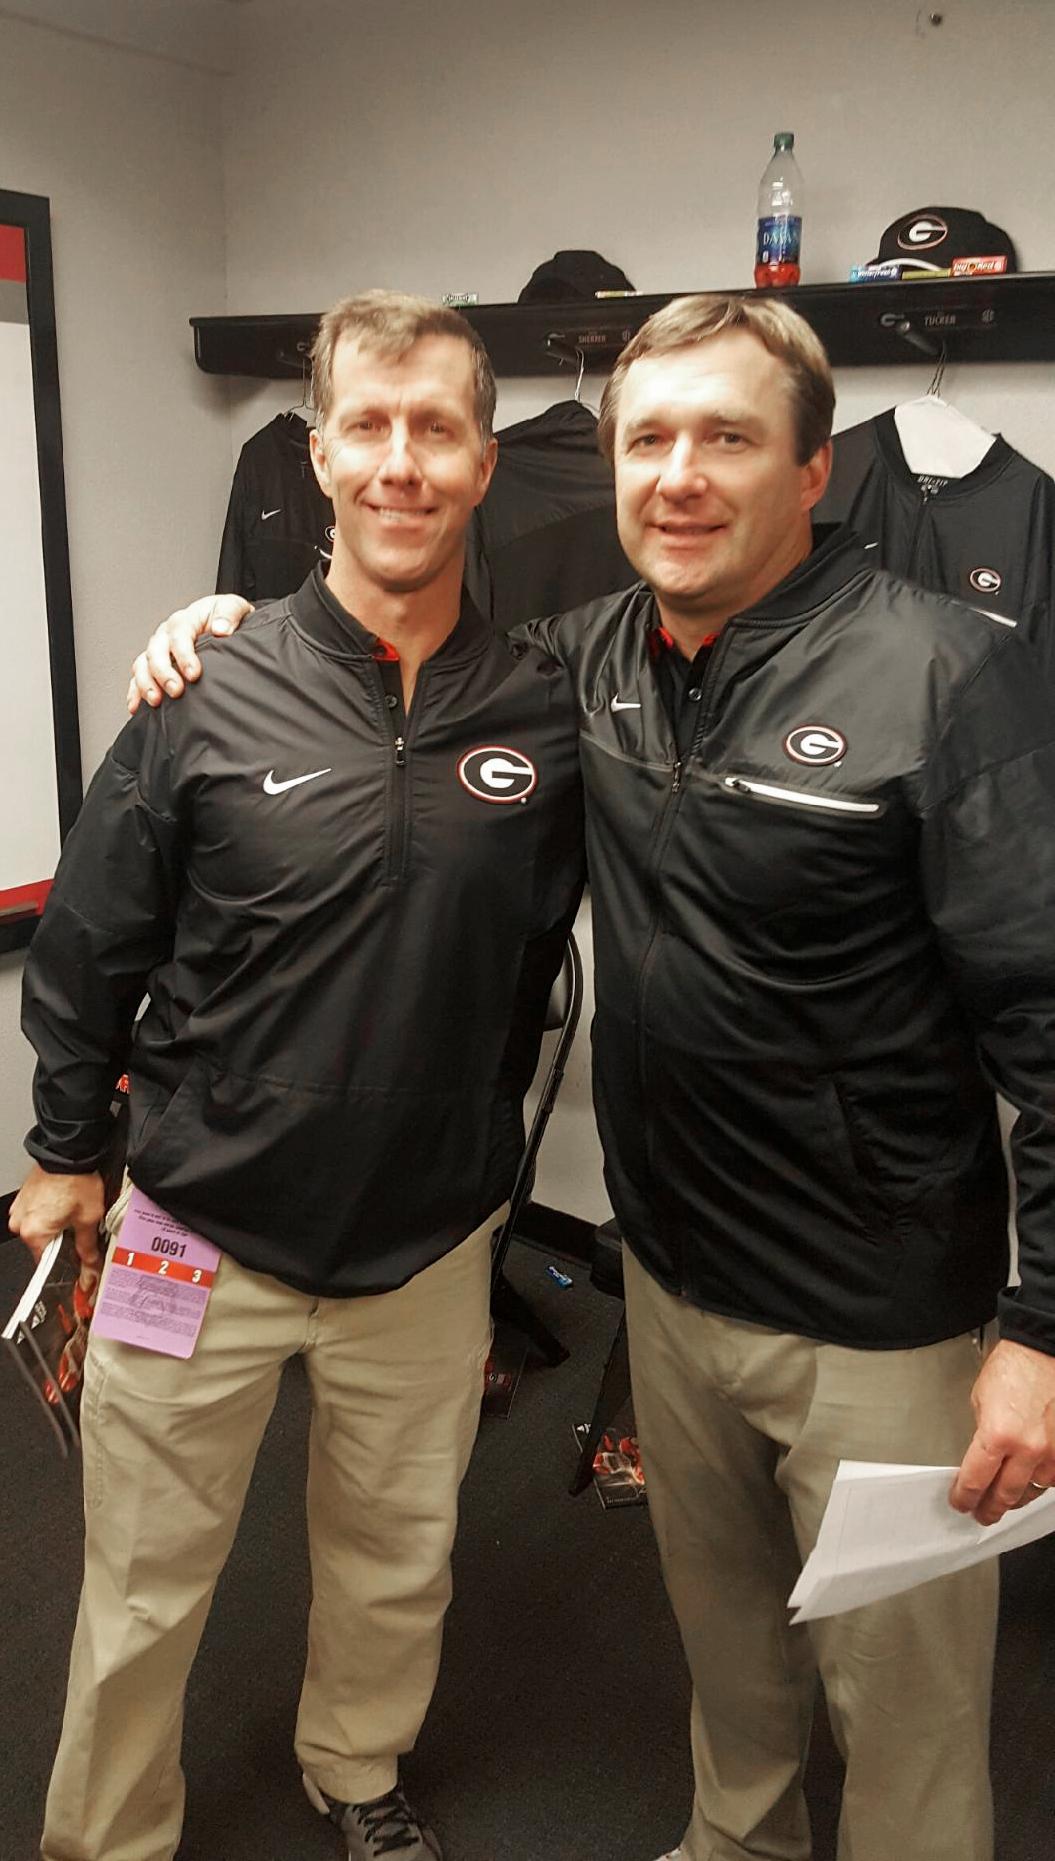 Tom and University of Georgia Head Coach, Kirby Smart